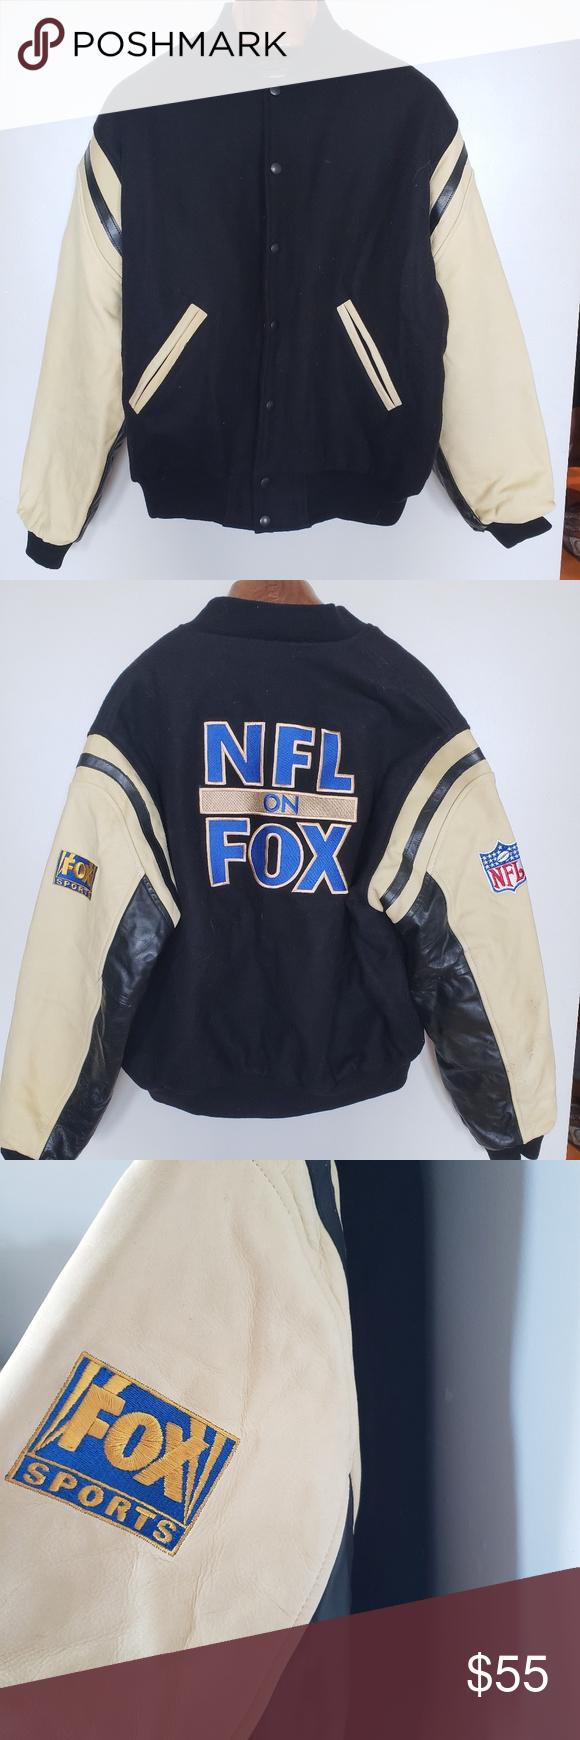 "NFL x FOX // vintage varsity letterman jacket • S i z e R e f e r e n c e • -Model: 5""2 • D e t a i l s • - wool & leather  -some signs ..."